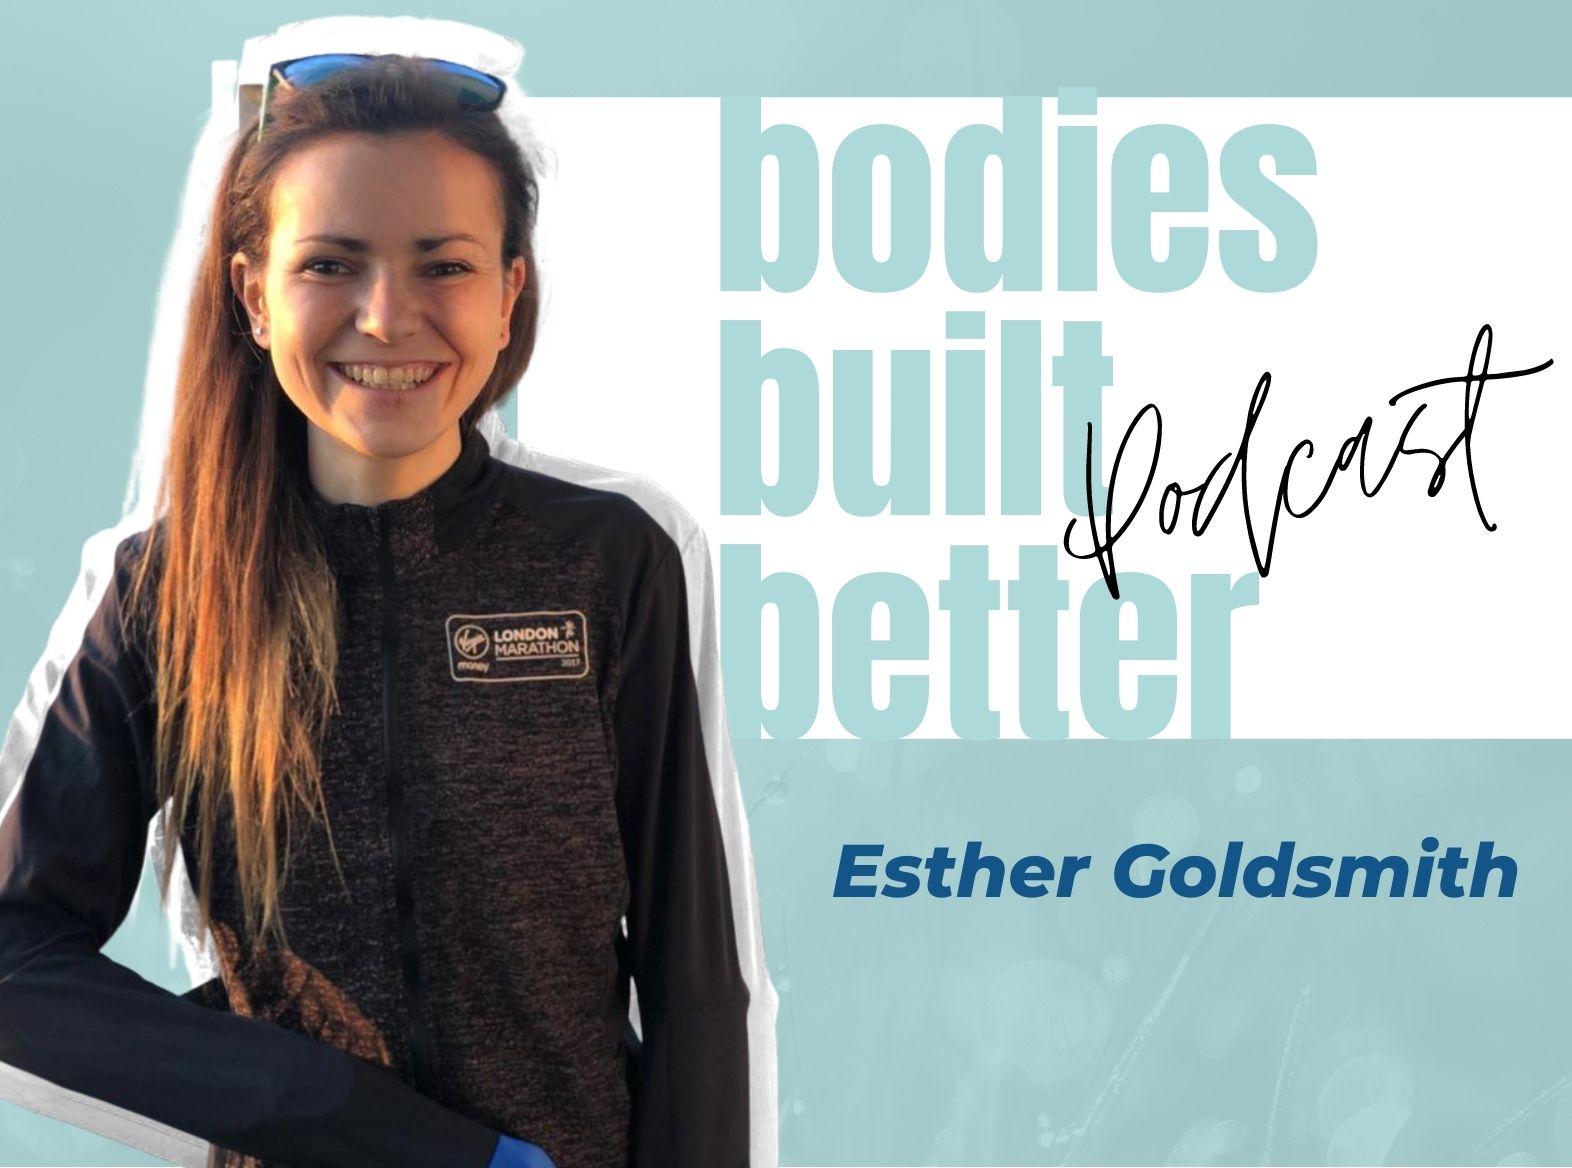 ESTHER GOLDSMITH